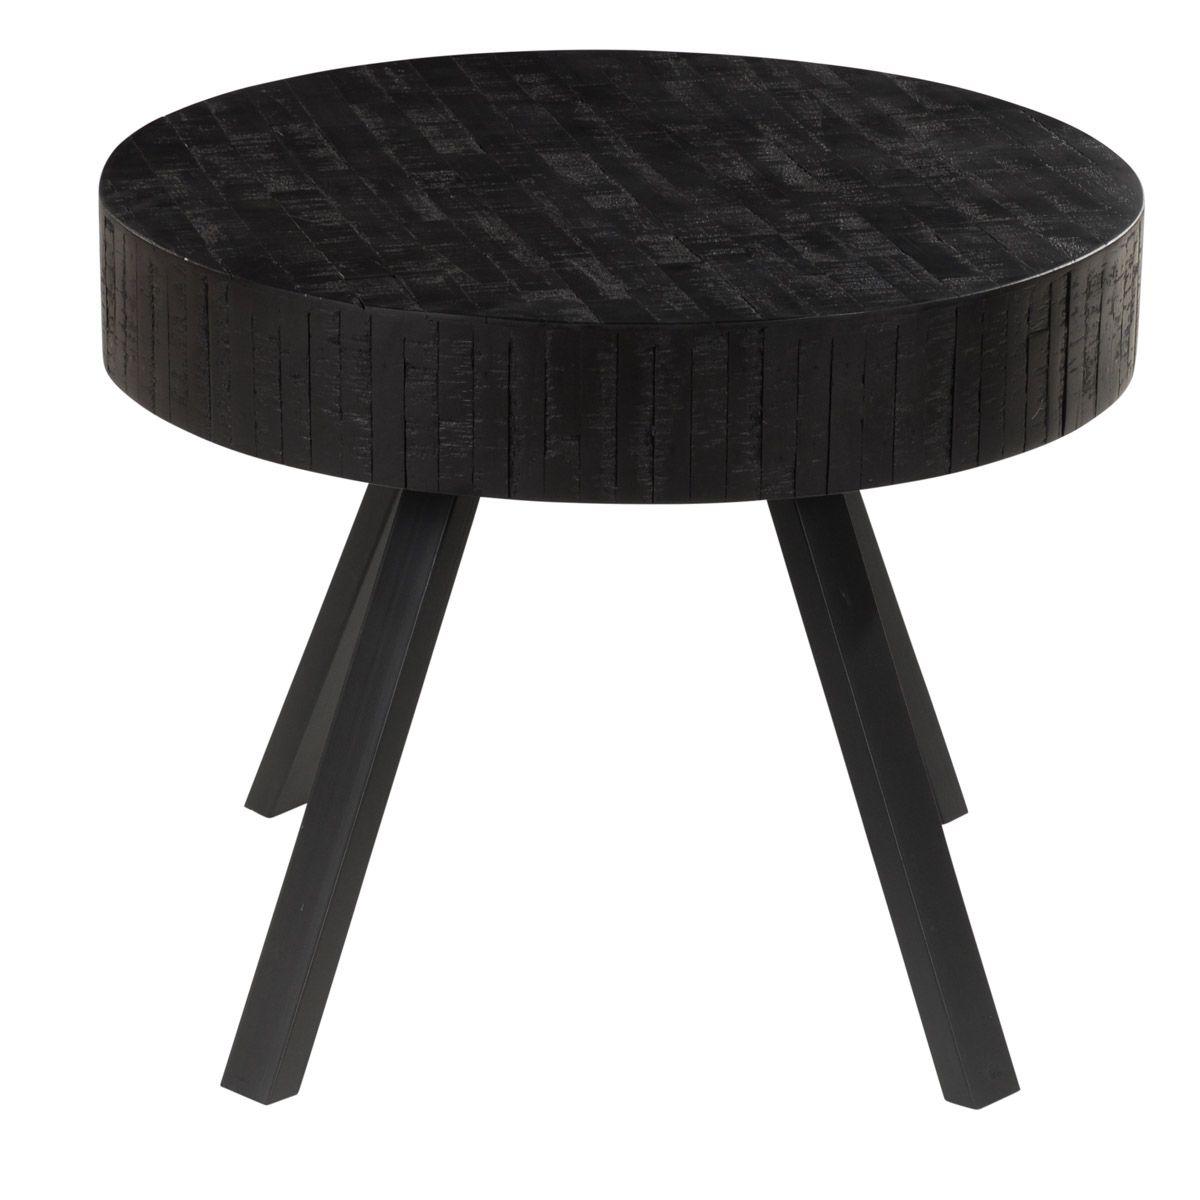 Table basse en teck recyclé noir HARPER